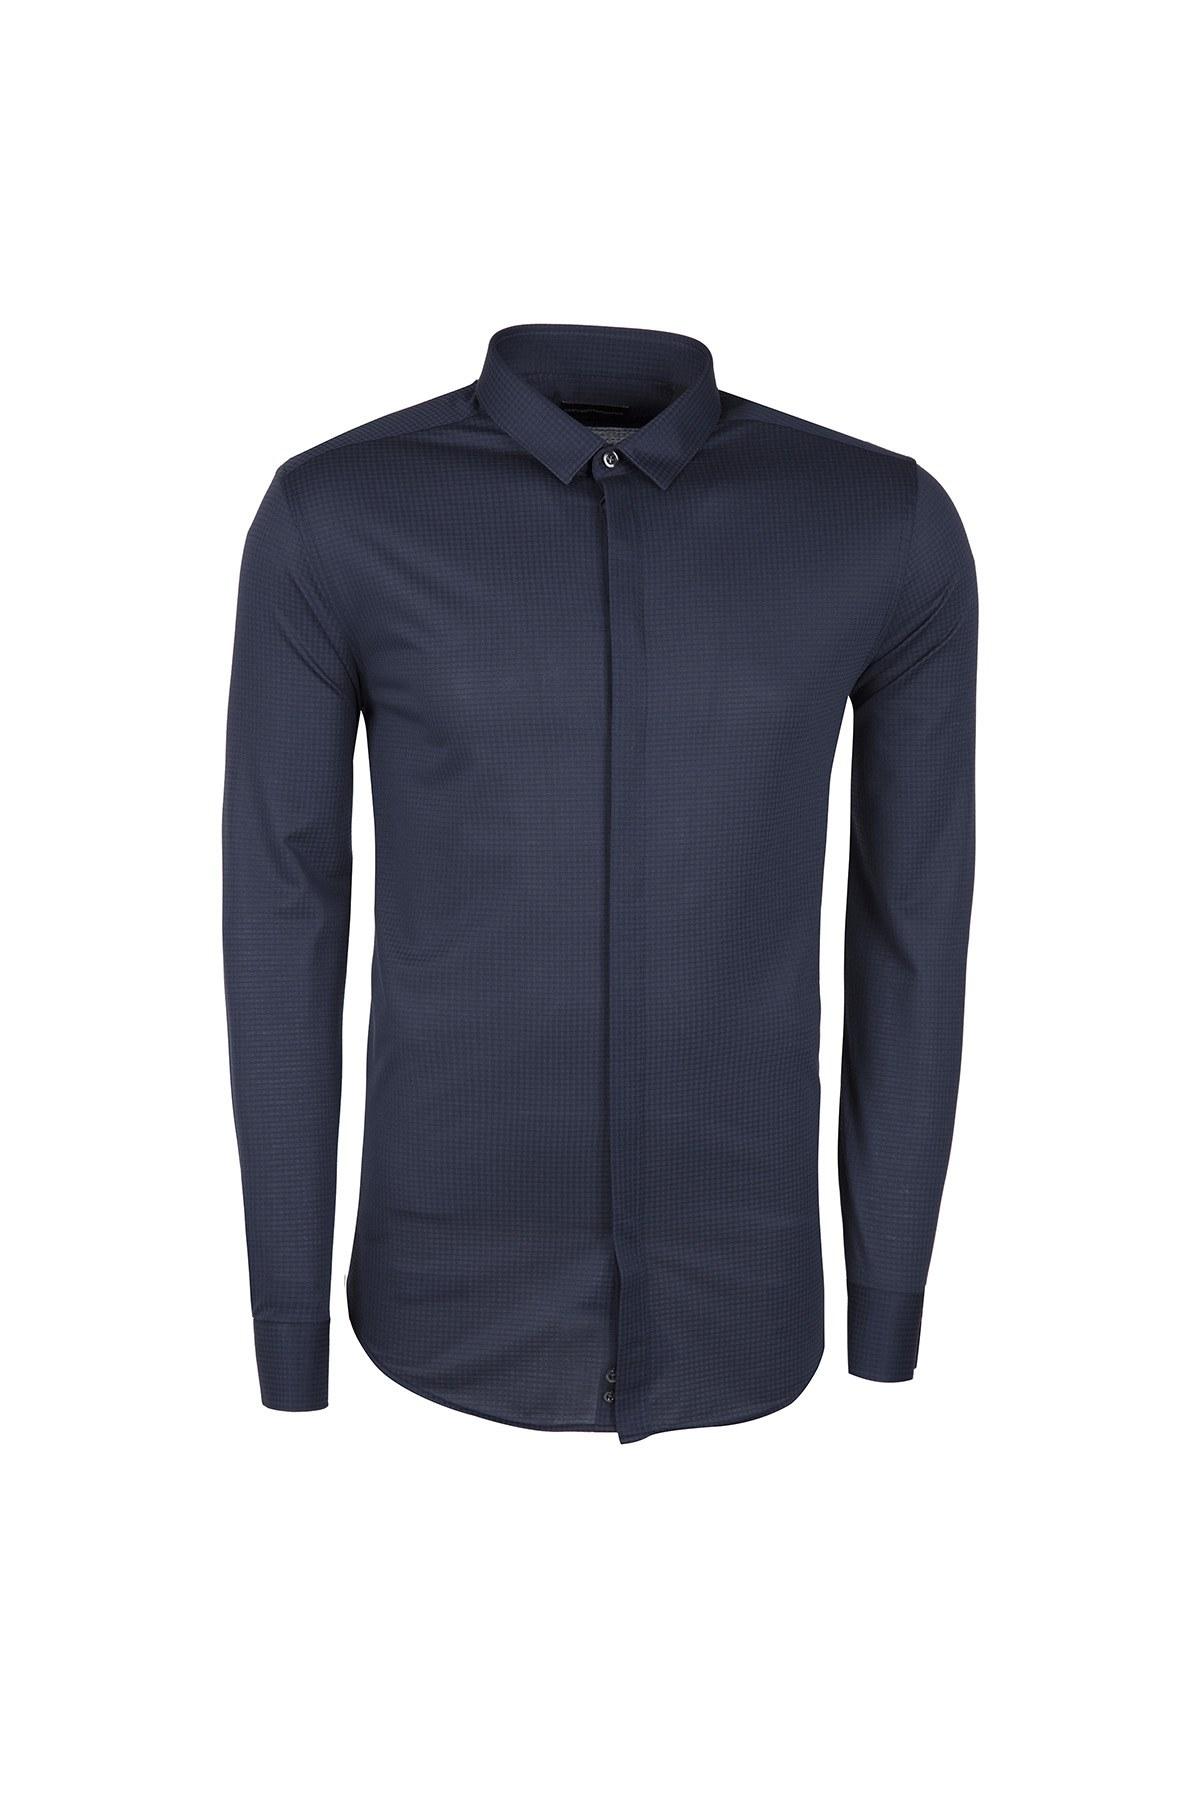 EMPORIO ARMANI Erkek Gömlek W1CC2T W160C LACİVERT